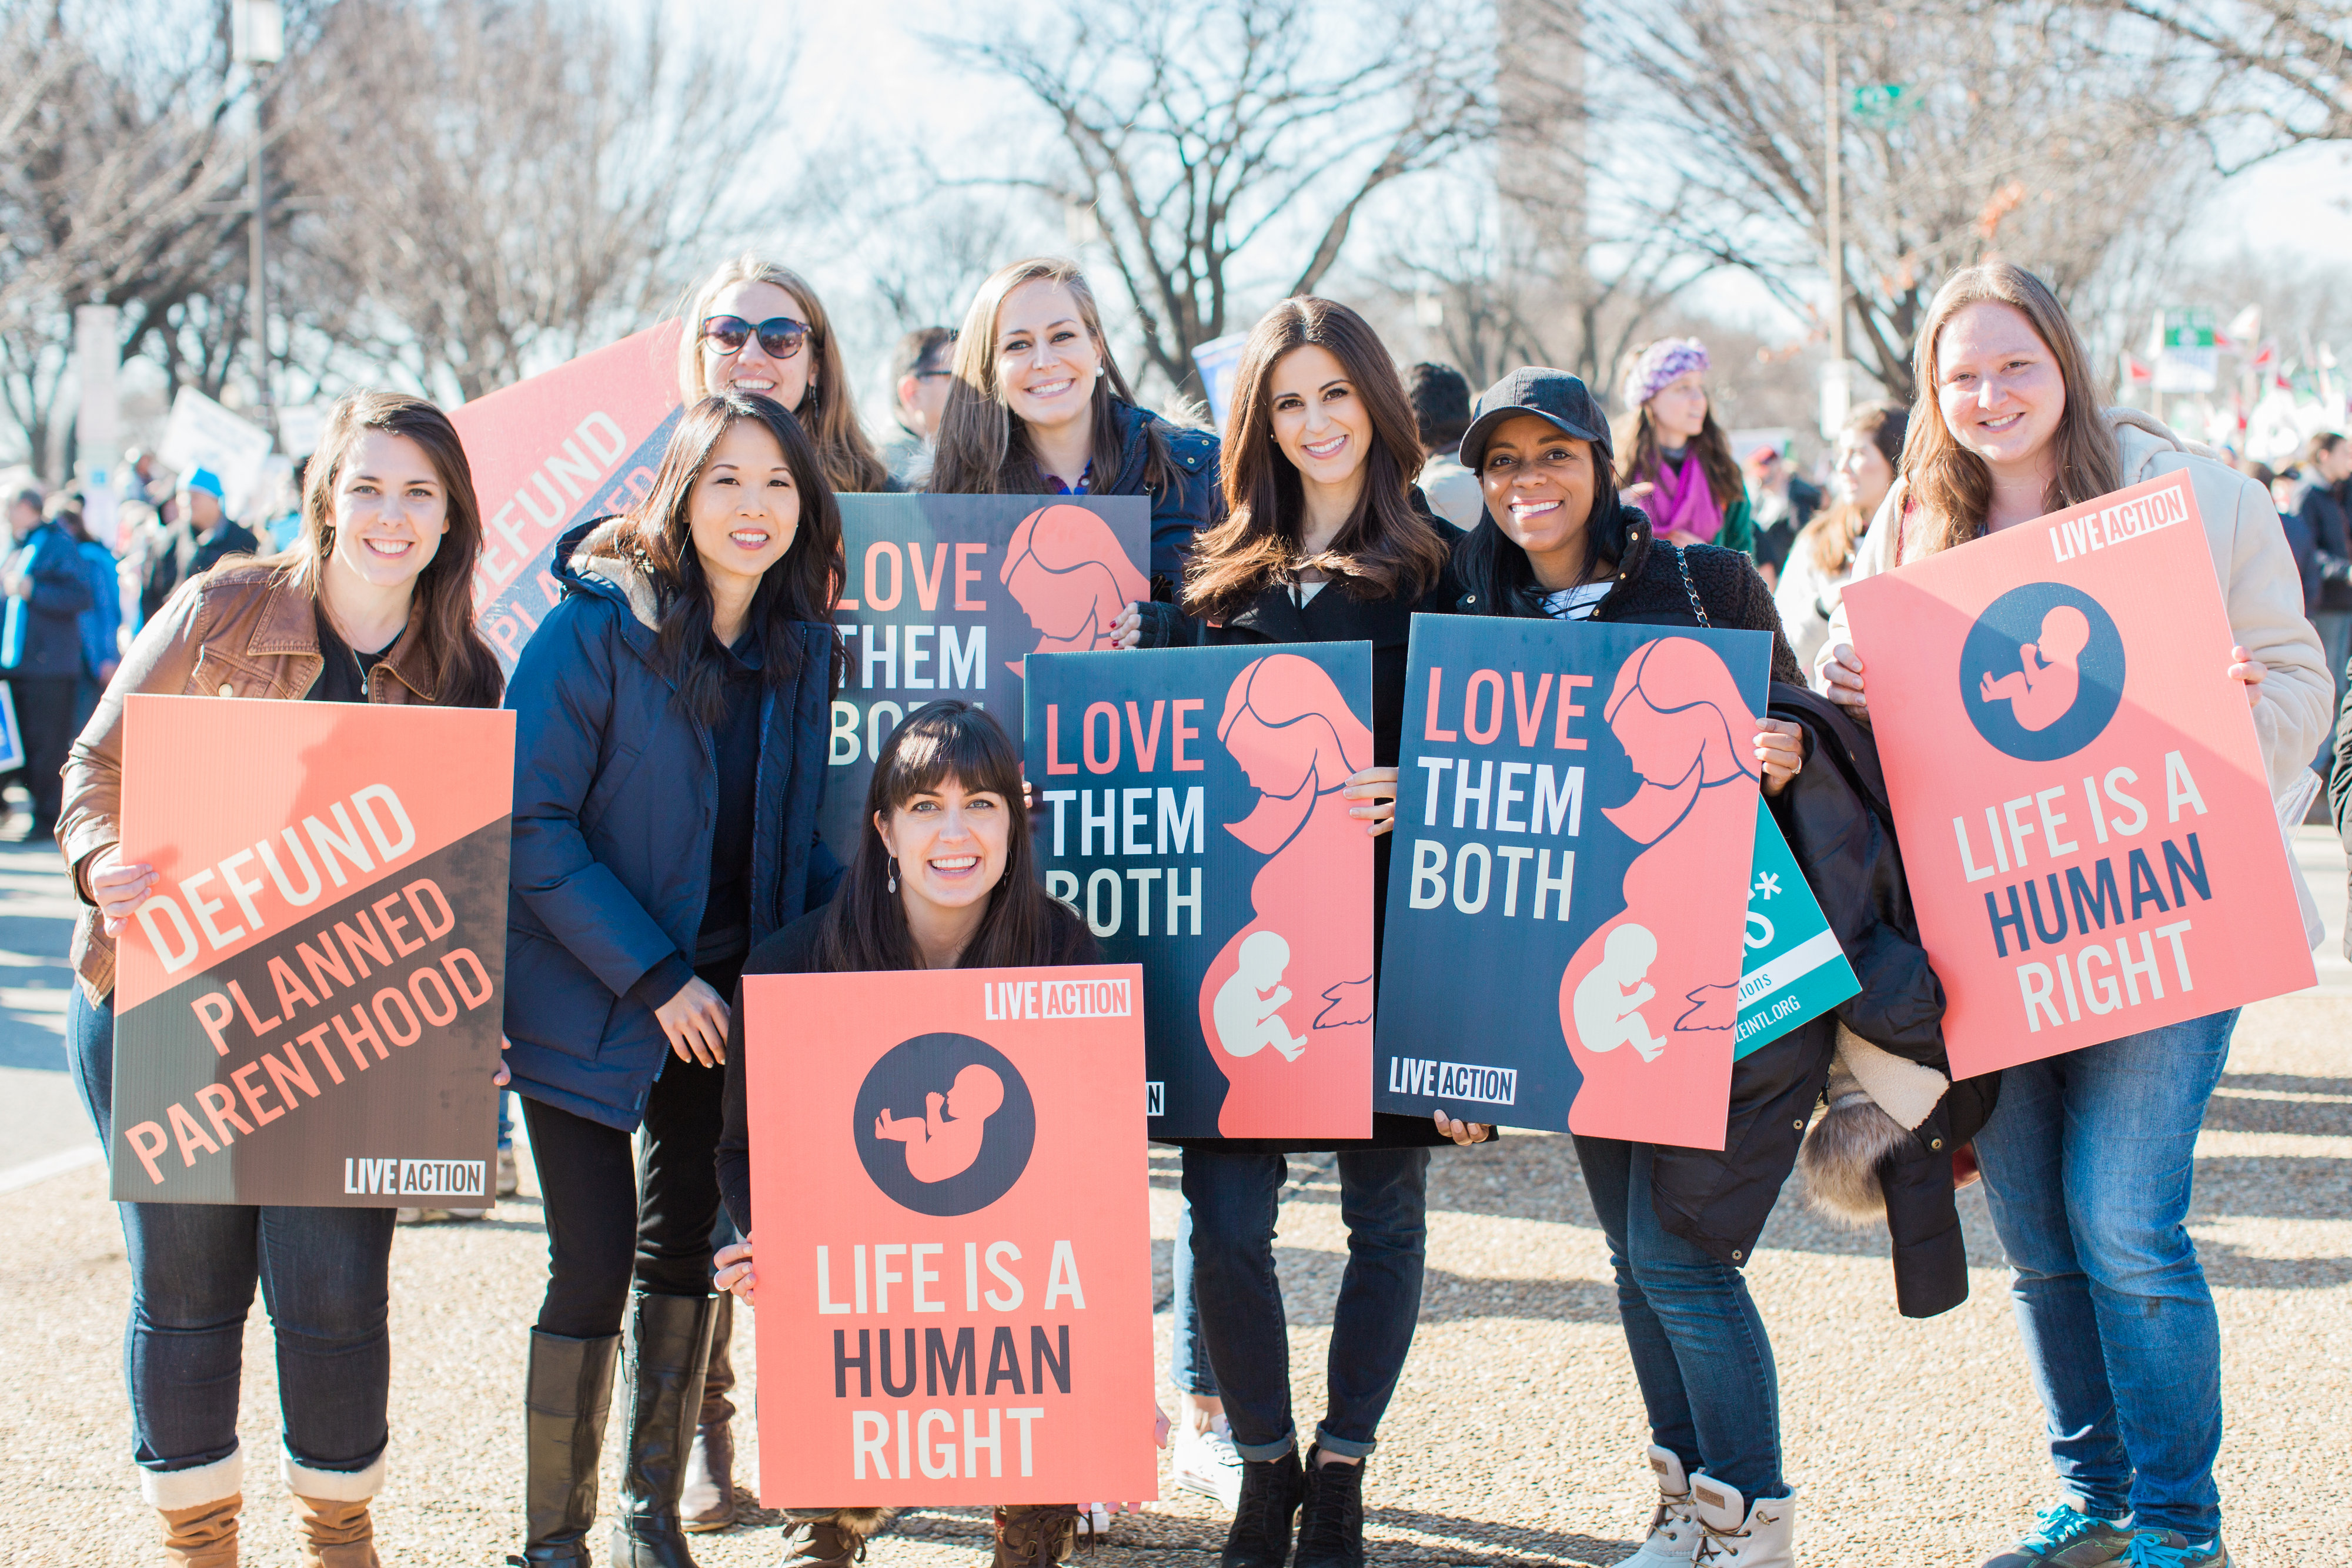 Inhuman: Late-Term Abortion